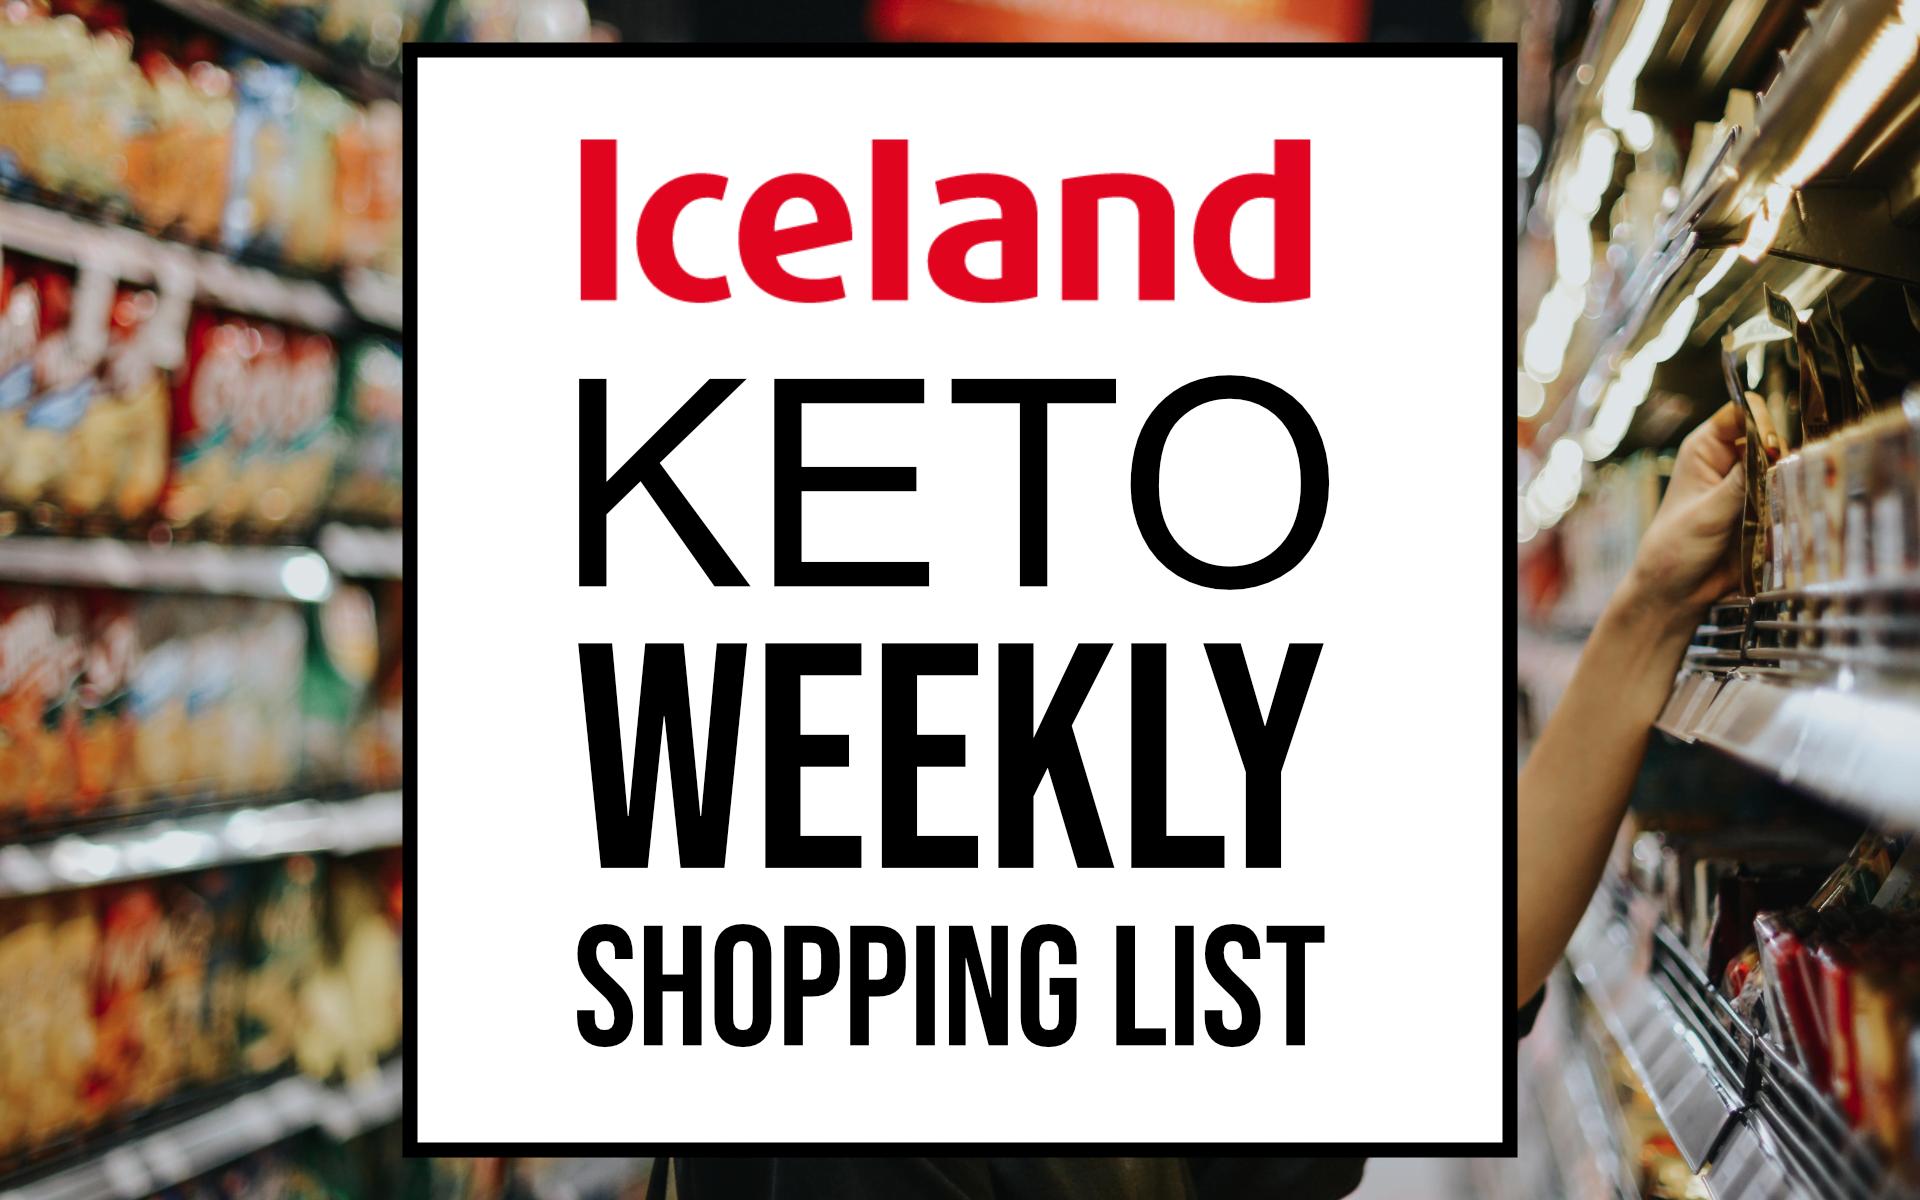 iceland keto weekly shopping list